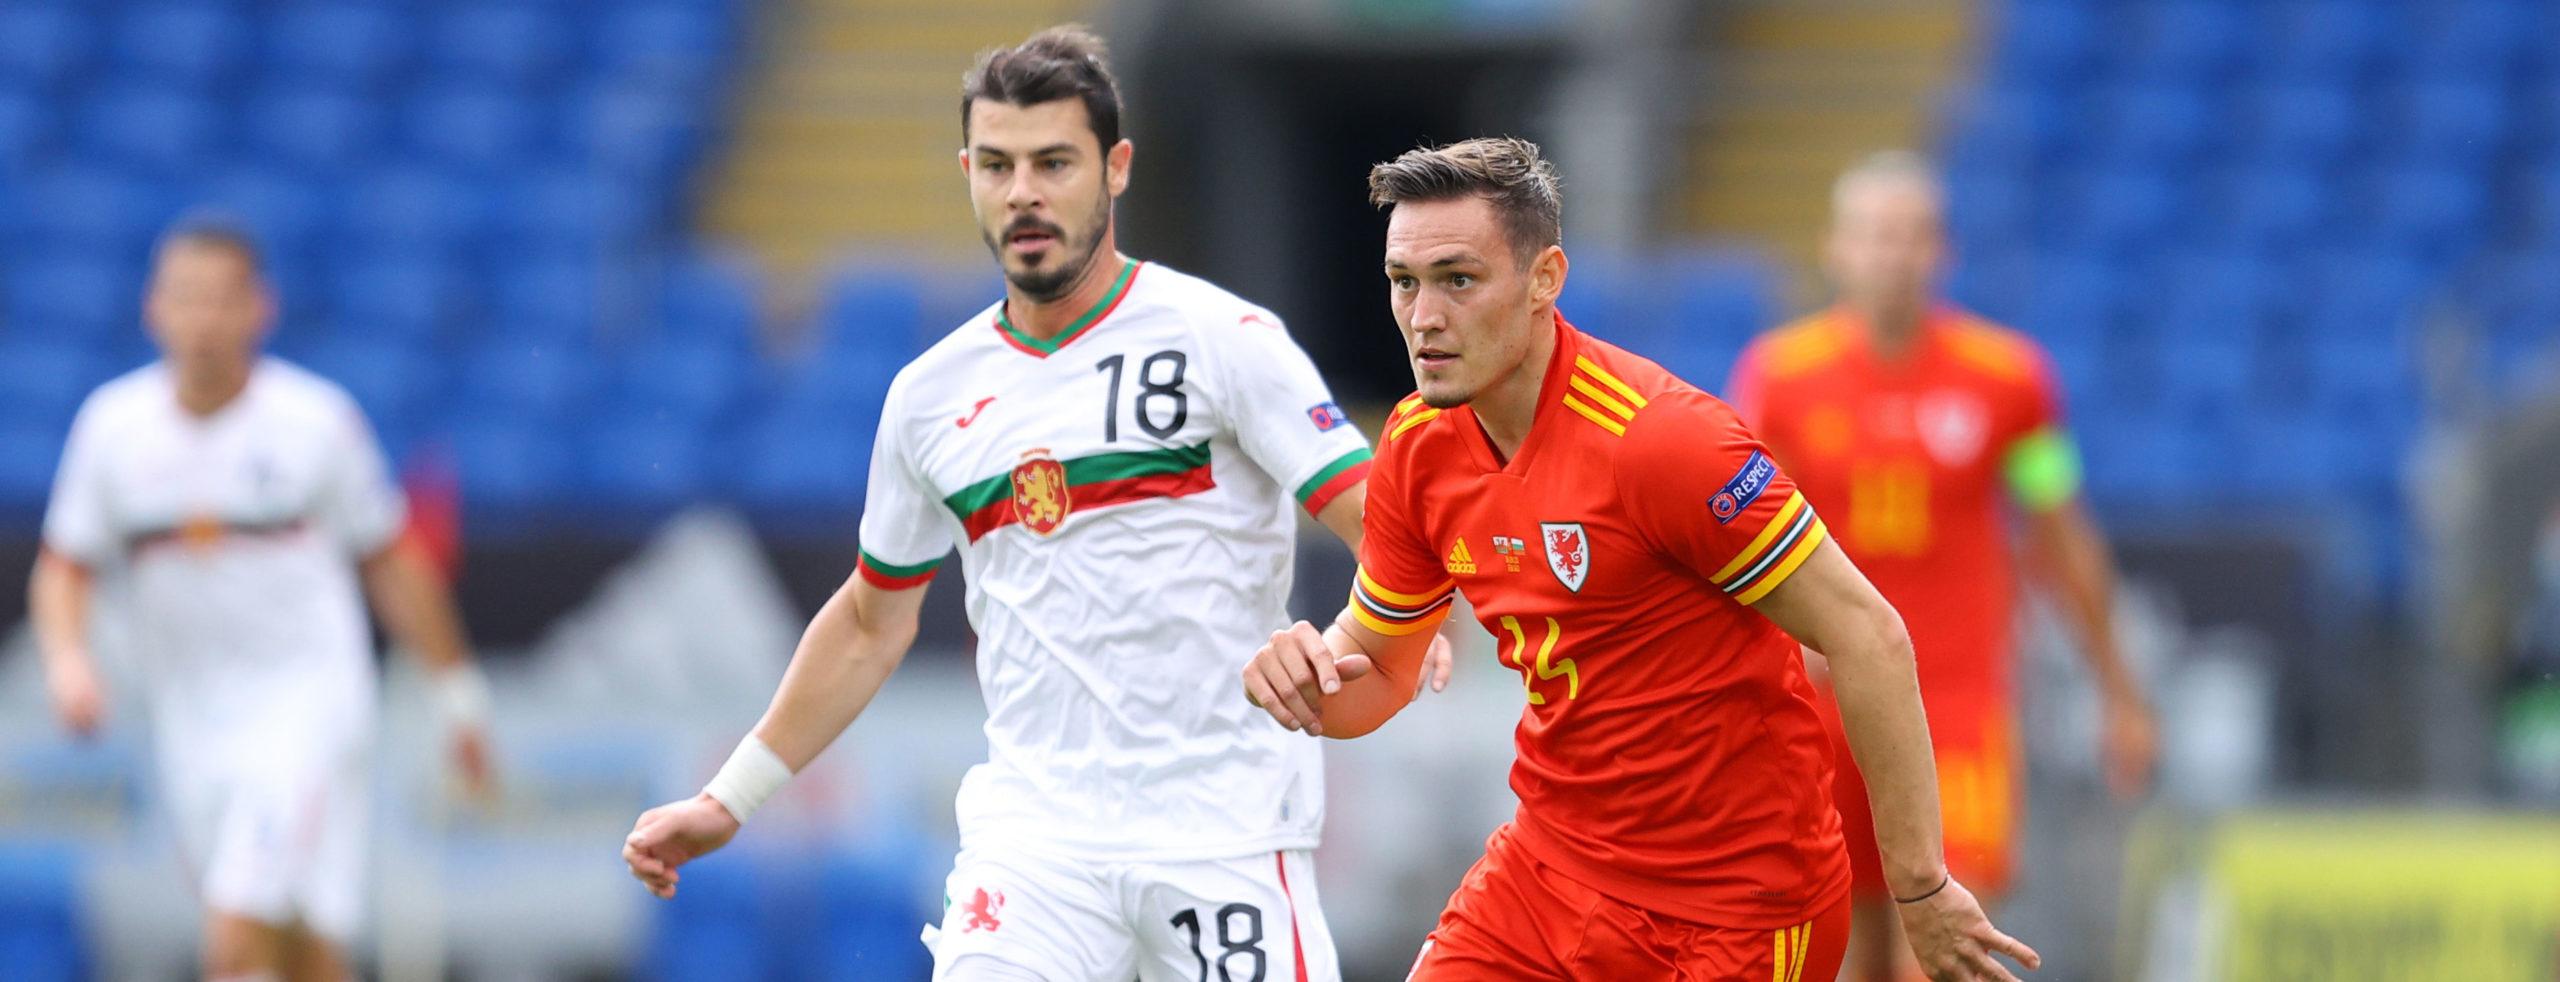 Bulgaria vs Wales: Visitors to nick narrow win